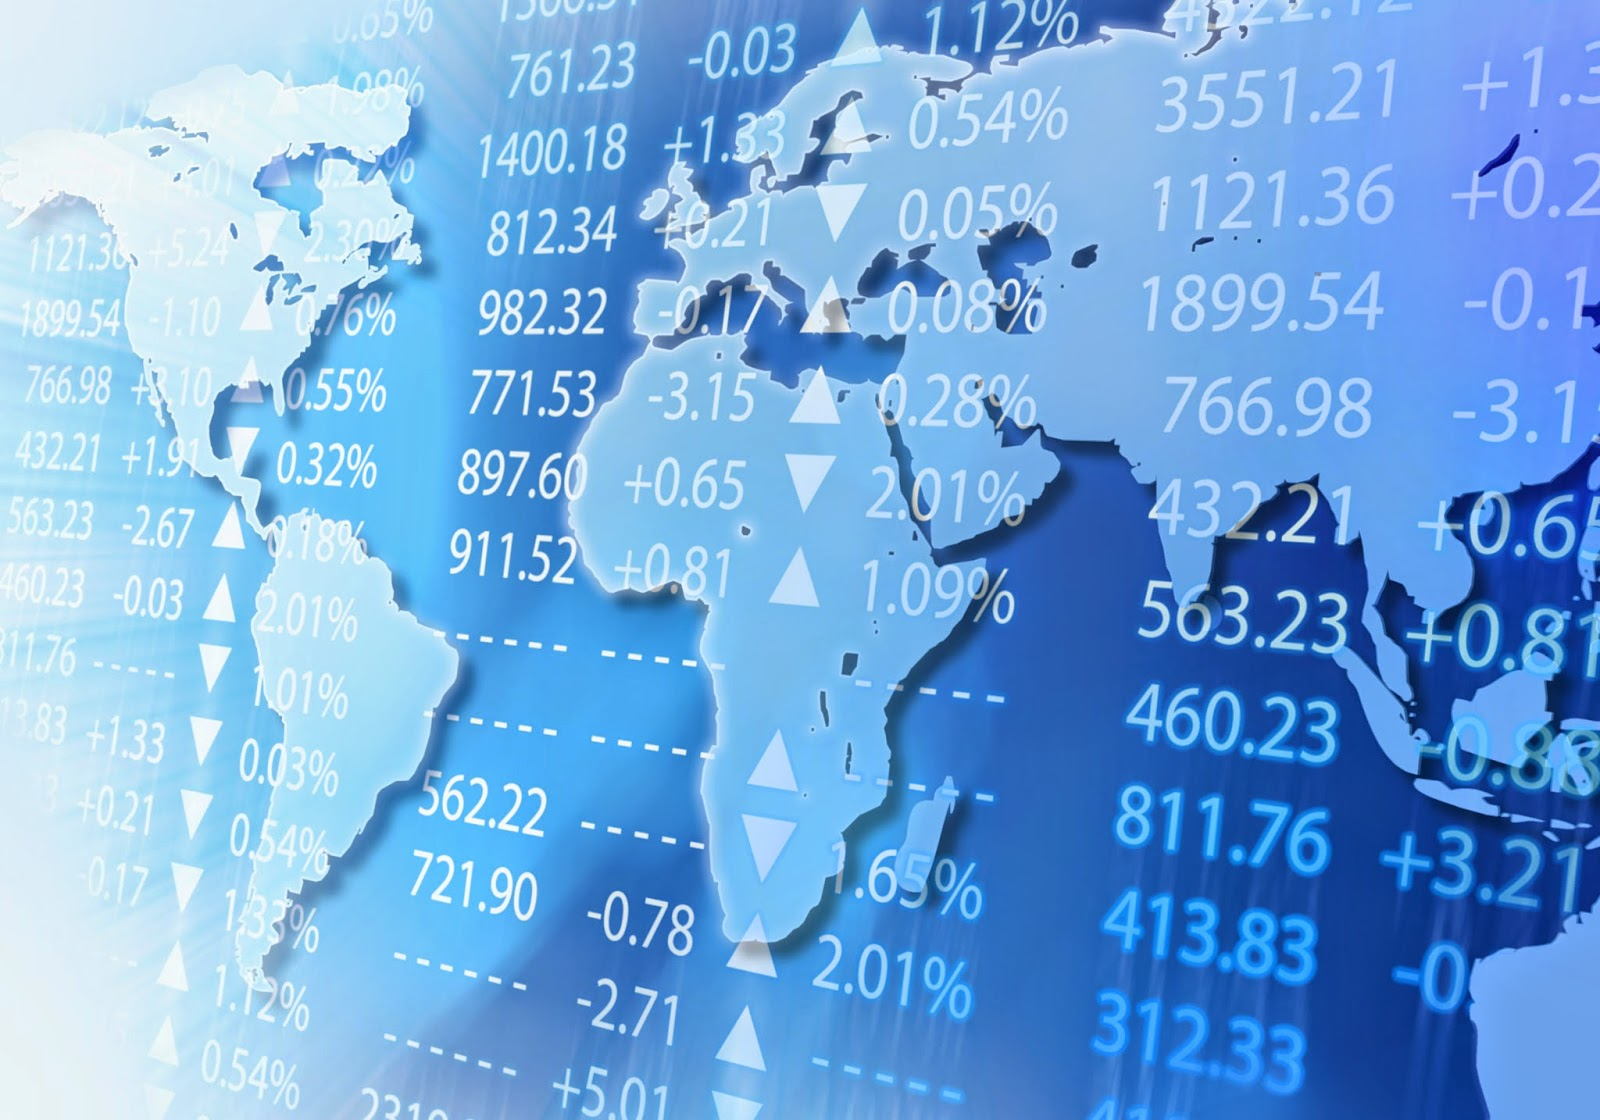 Cara belajar trading saham online